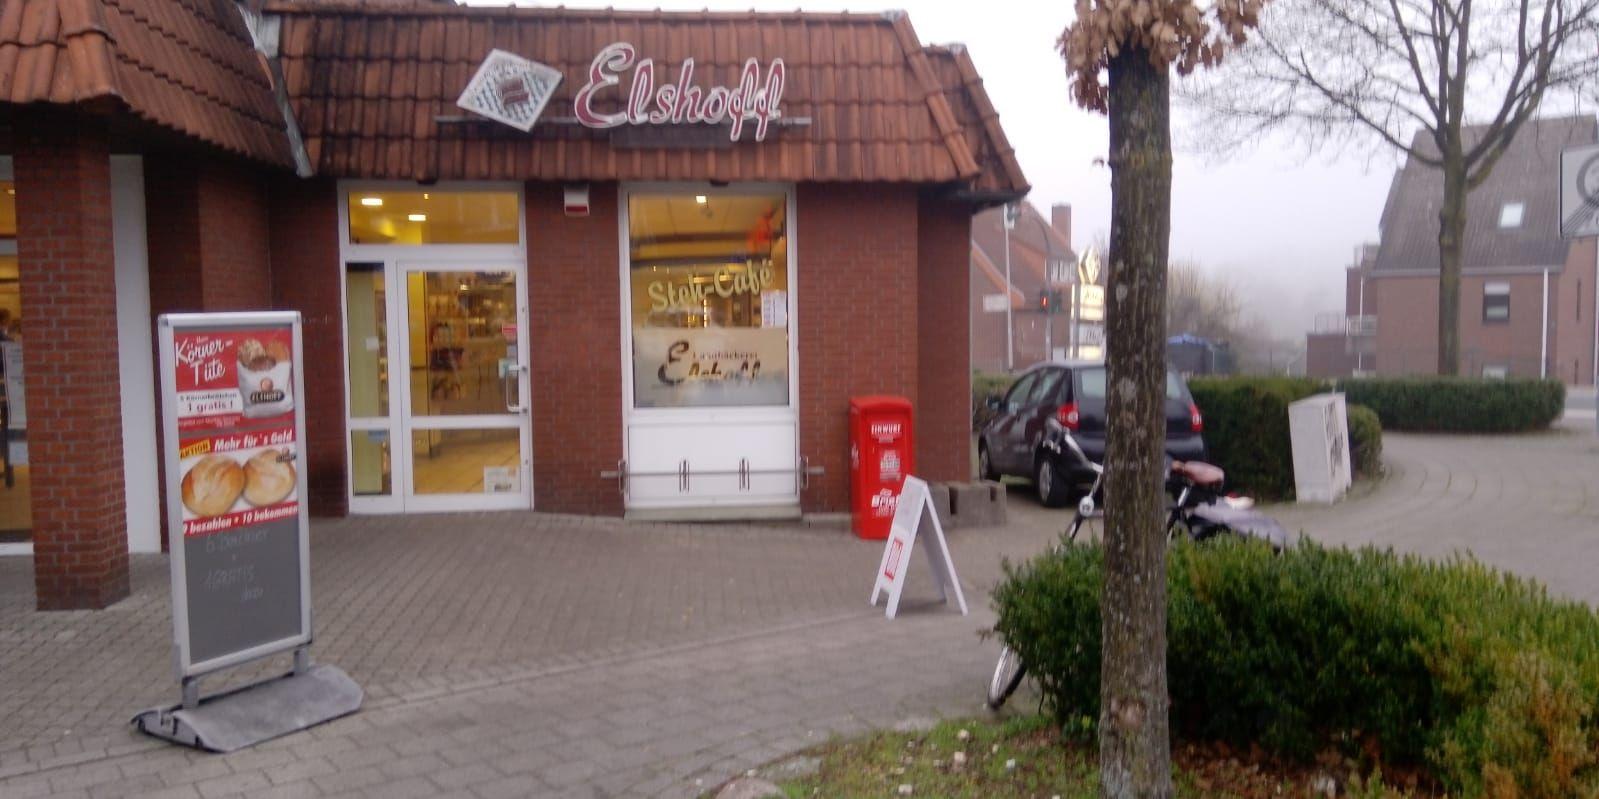 Die Landbäckerei Elshoff in Münster